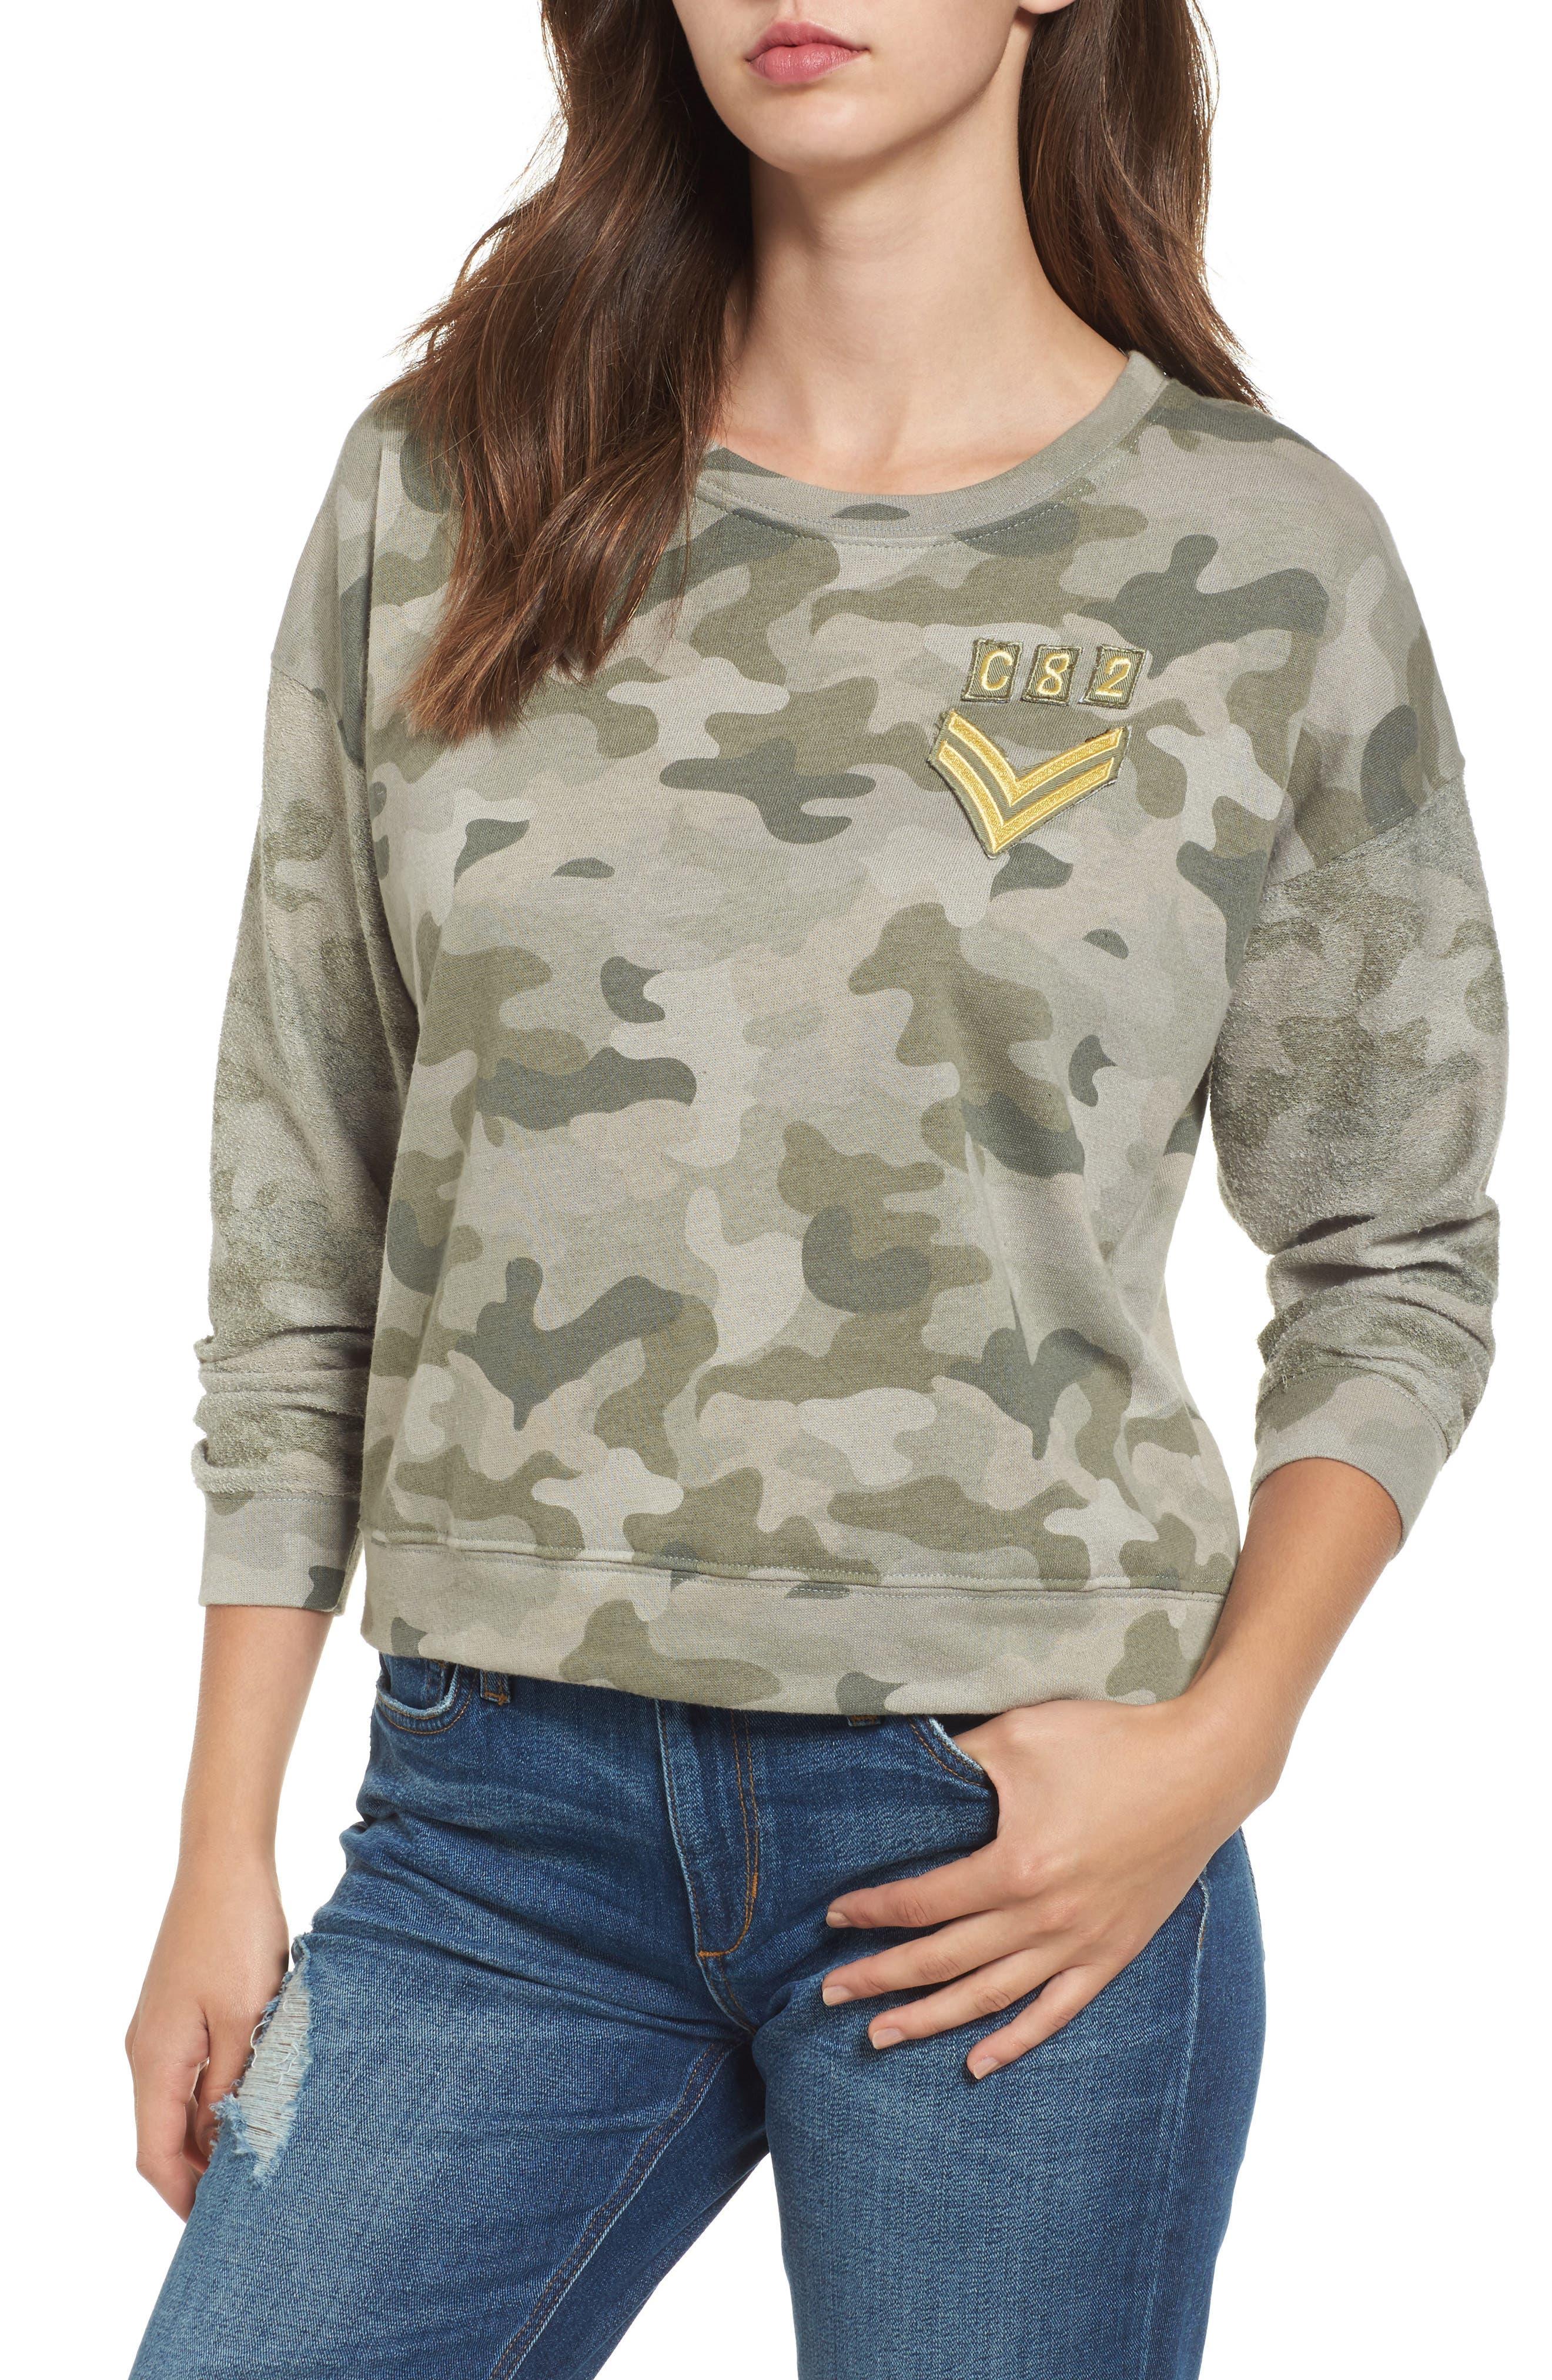 Alternate Image 1 Selected - Rails Kelli Camo Print Sweatshirt